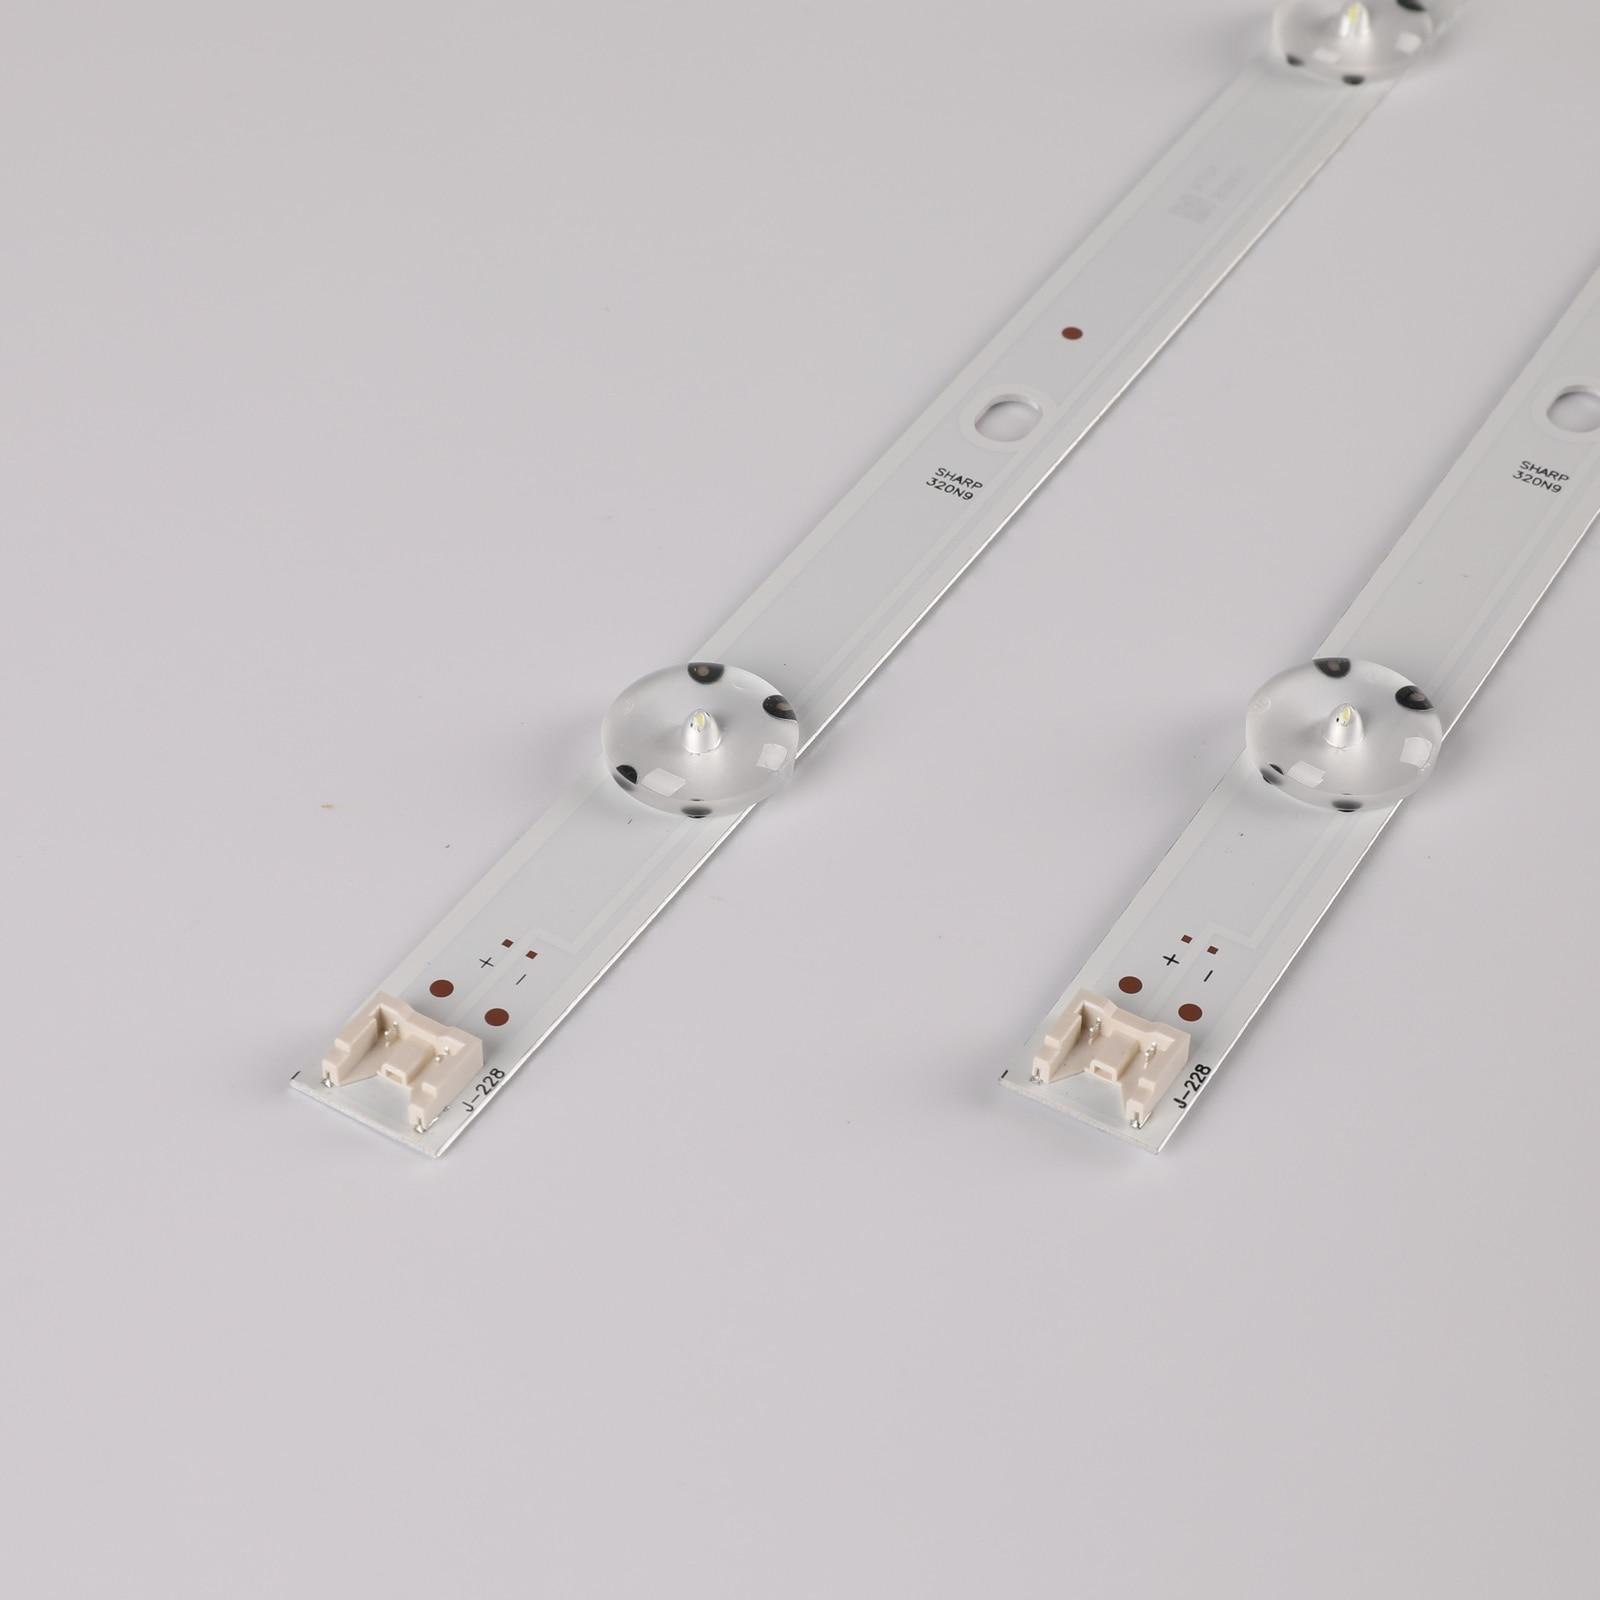 led backlight strip 5 lamp for lg 32tv innotek direct 15 5y 32inch 32lf510b 32lh590u svl320al5 dh lf51 32lh51 hd ssc 32inch hd LED Backlight strip 5 lamp SSC_32inch_HD_REV05_150925 32LH51_HD for LG 32LH510B 32LF510U 32LH590U 32LH570B HC320DXN-VHVS2-214X